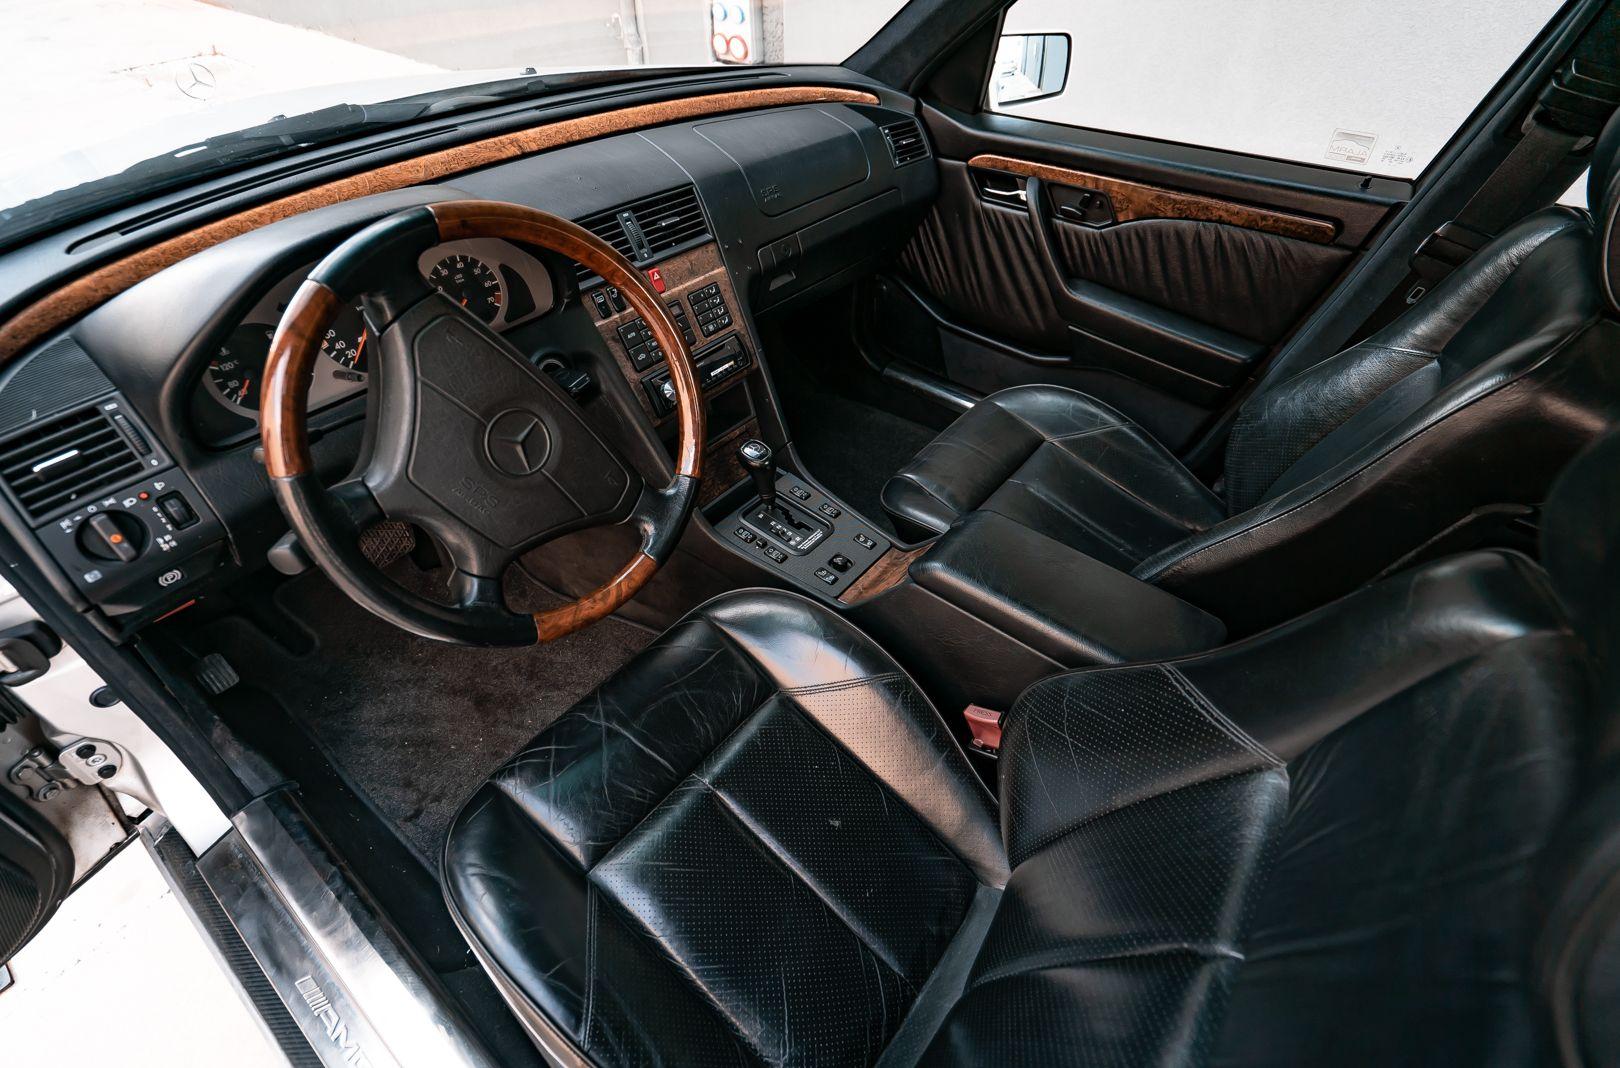 1995 Mercedes Benz C36 AMG 75832